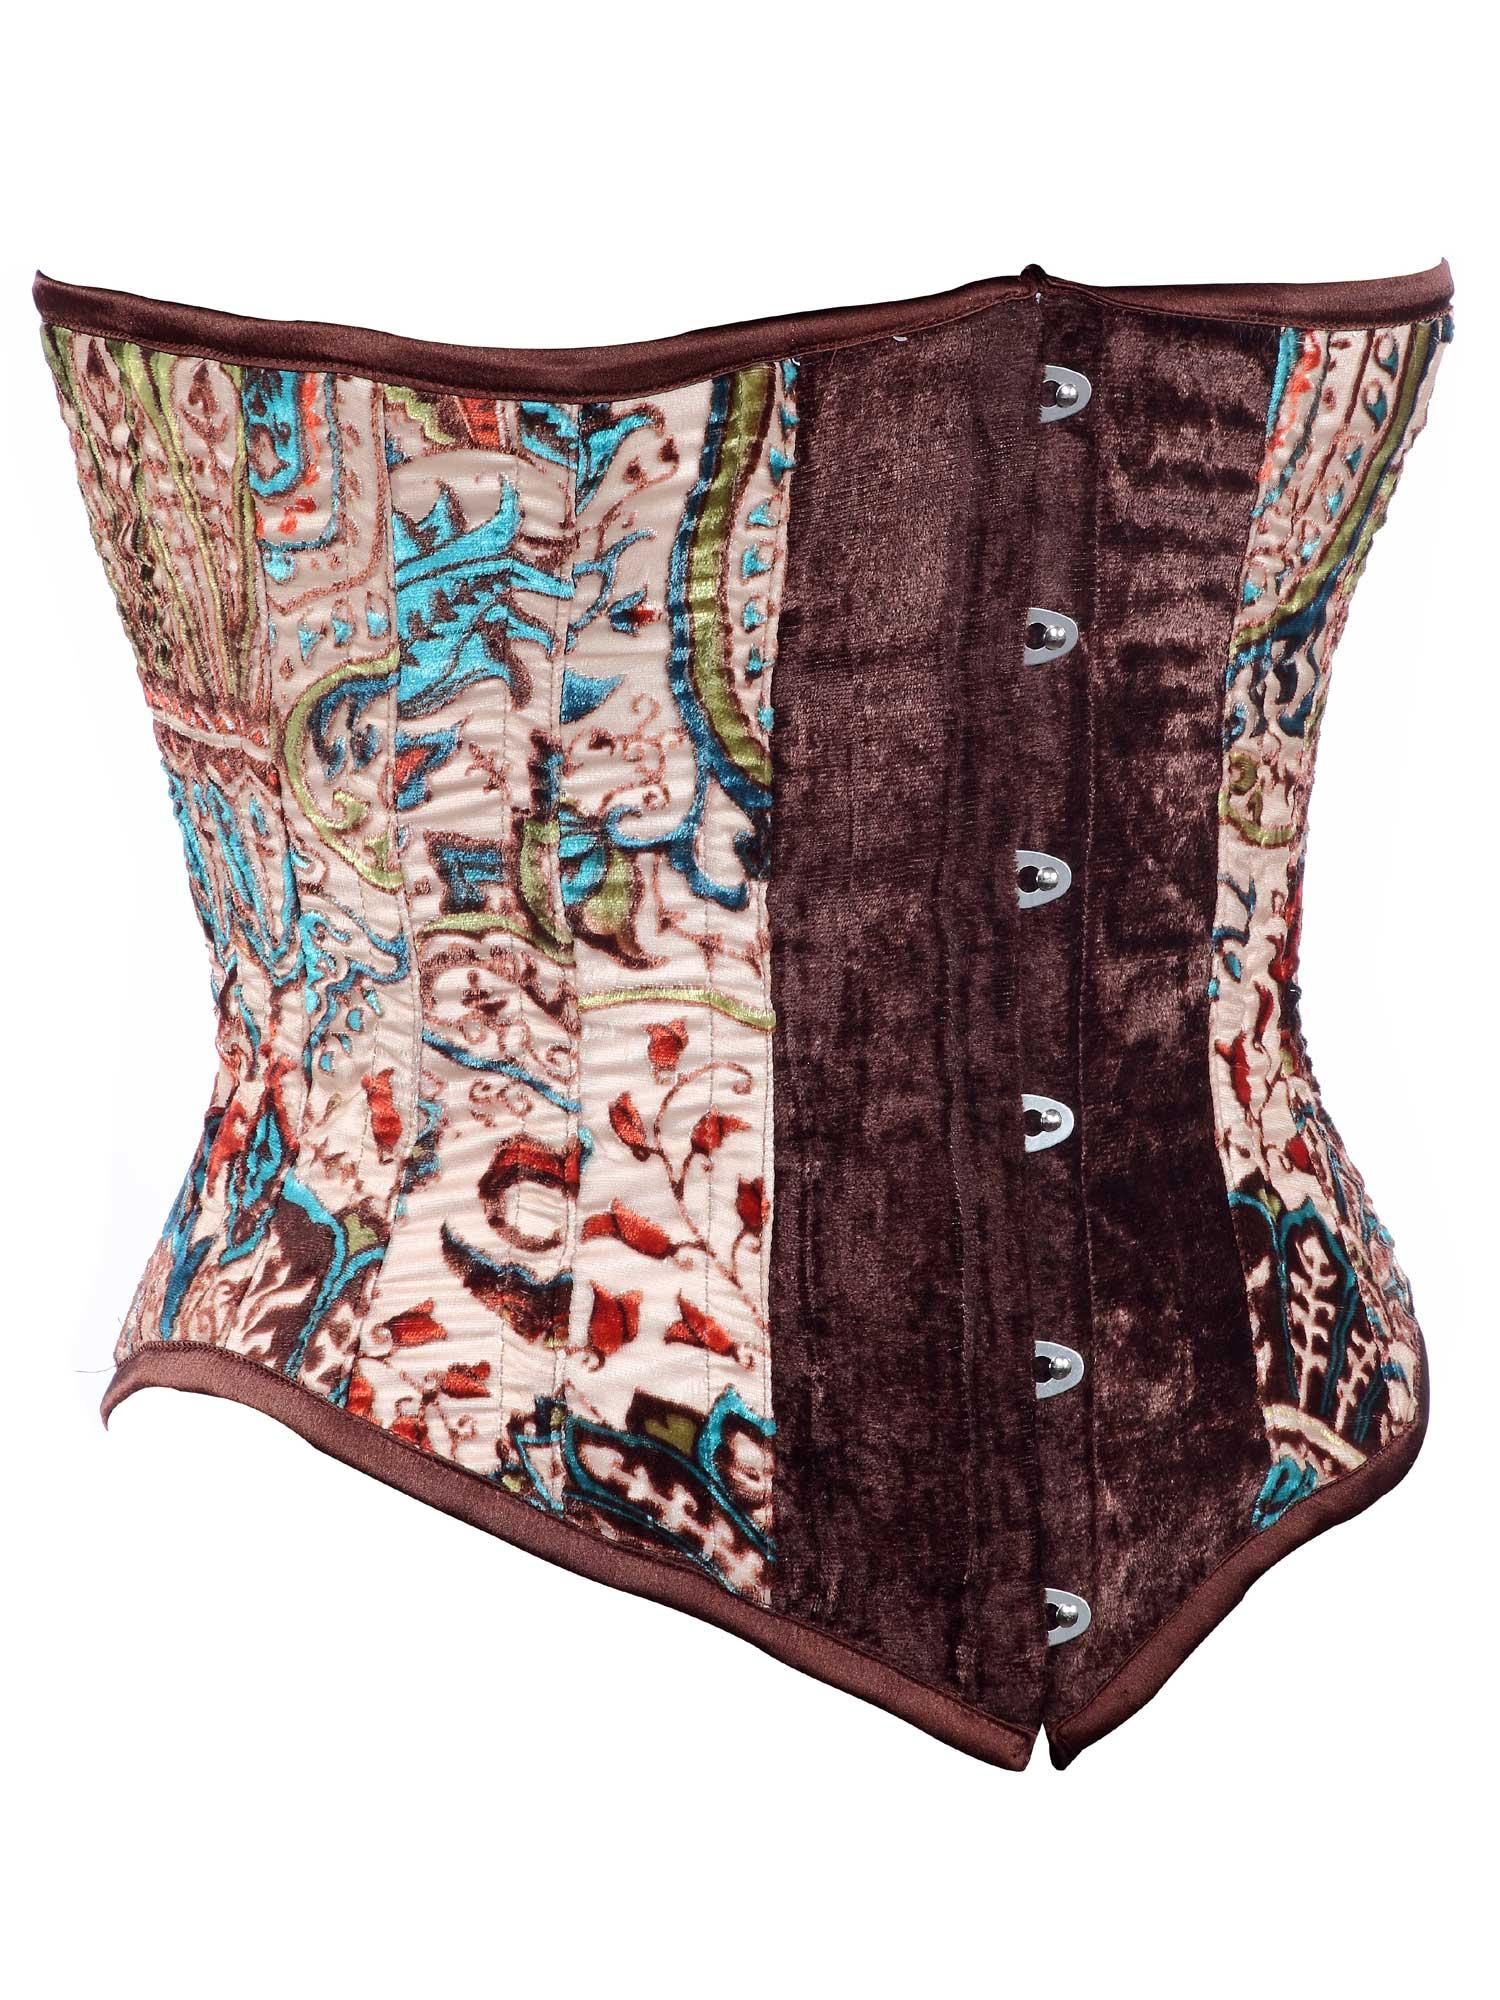 floral_velvet_fabric_steel_boning_underbust_corset_waist_cincher_bustier_bustiers_and_corsets_4.jpg